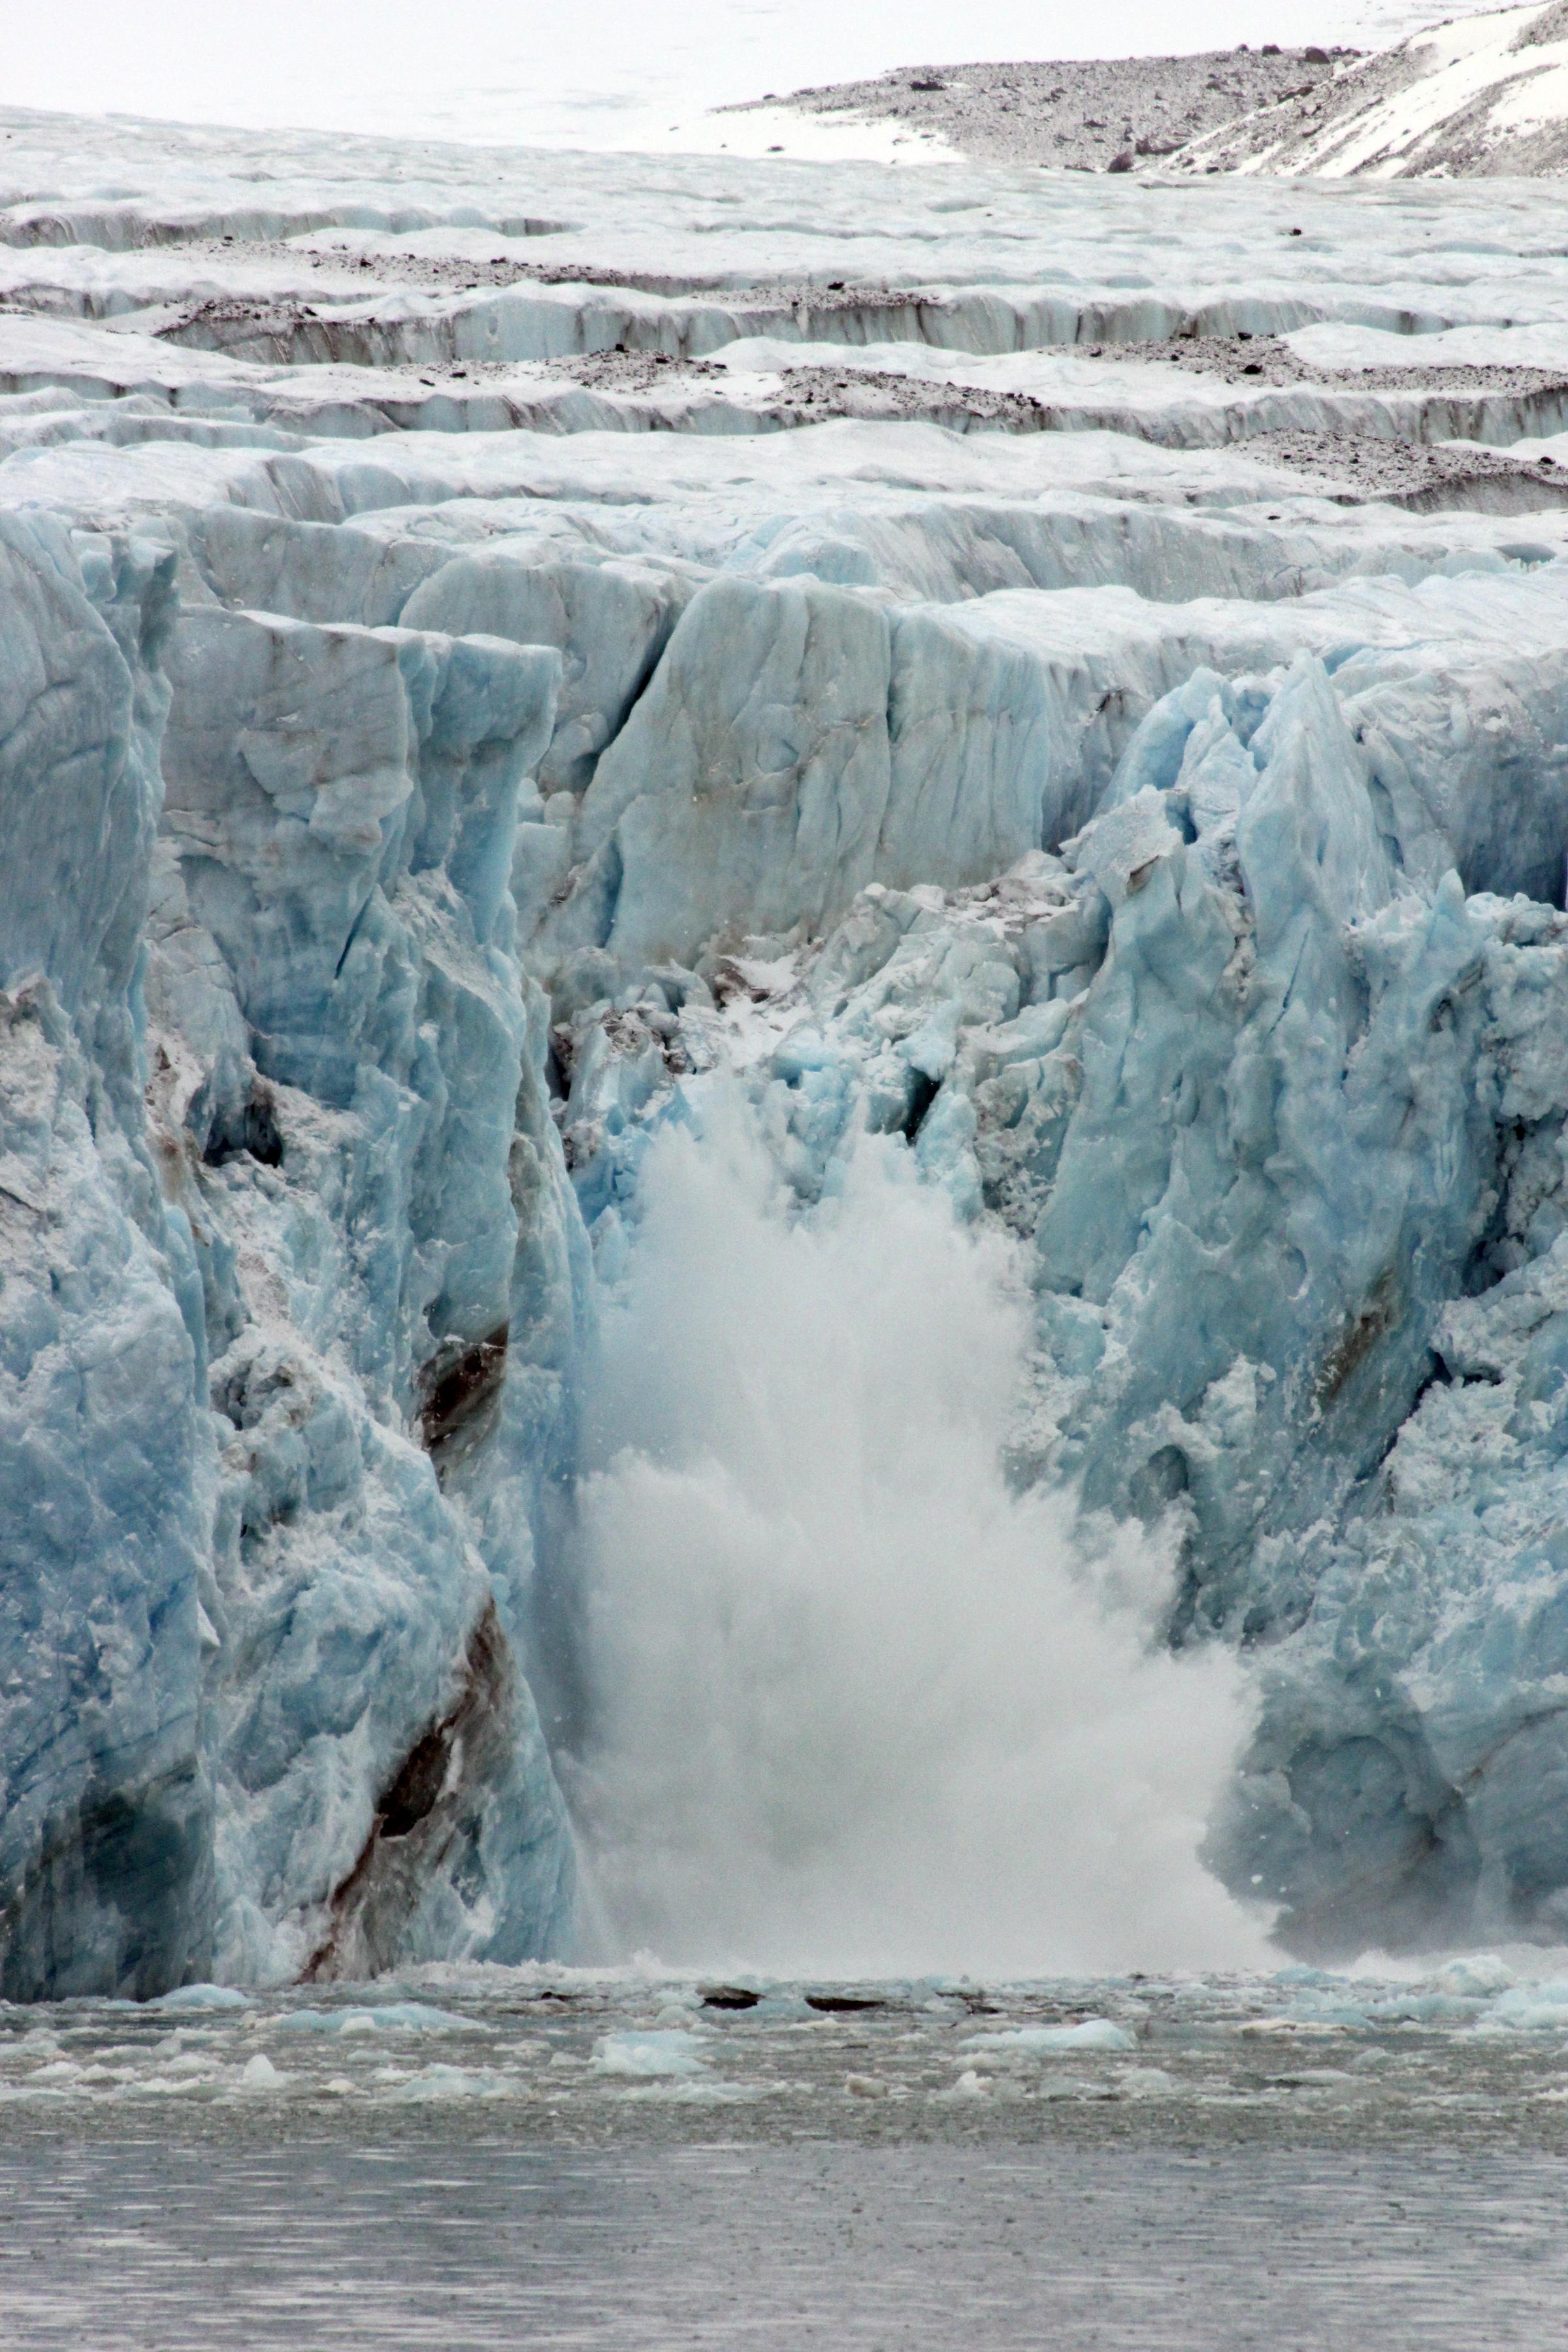 Calving_Glacier_credit_Danielle_Eubank_Svalbard_Oct2014